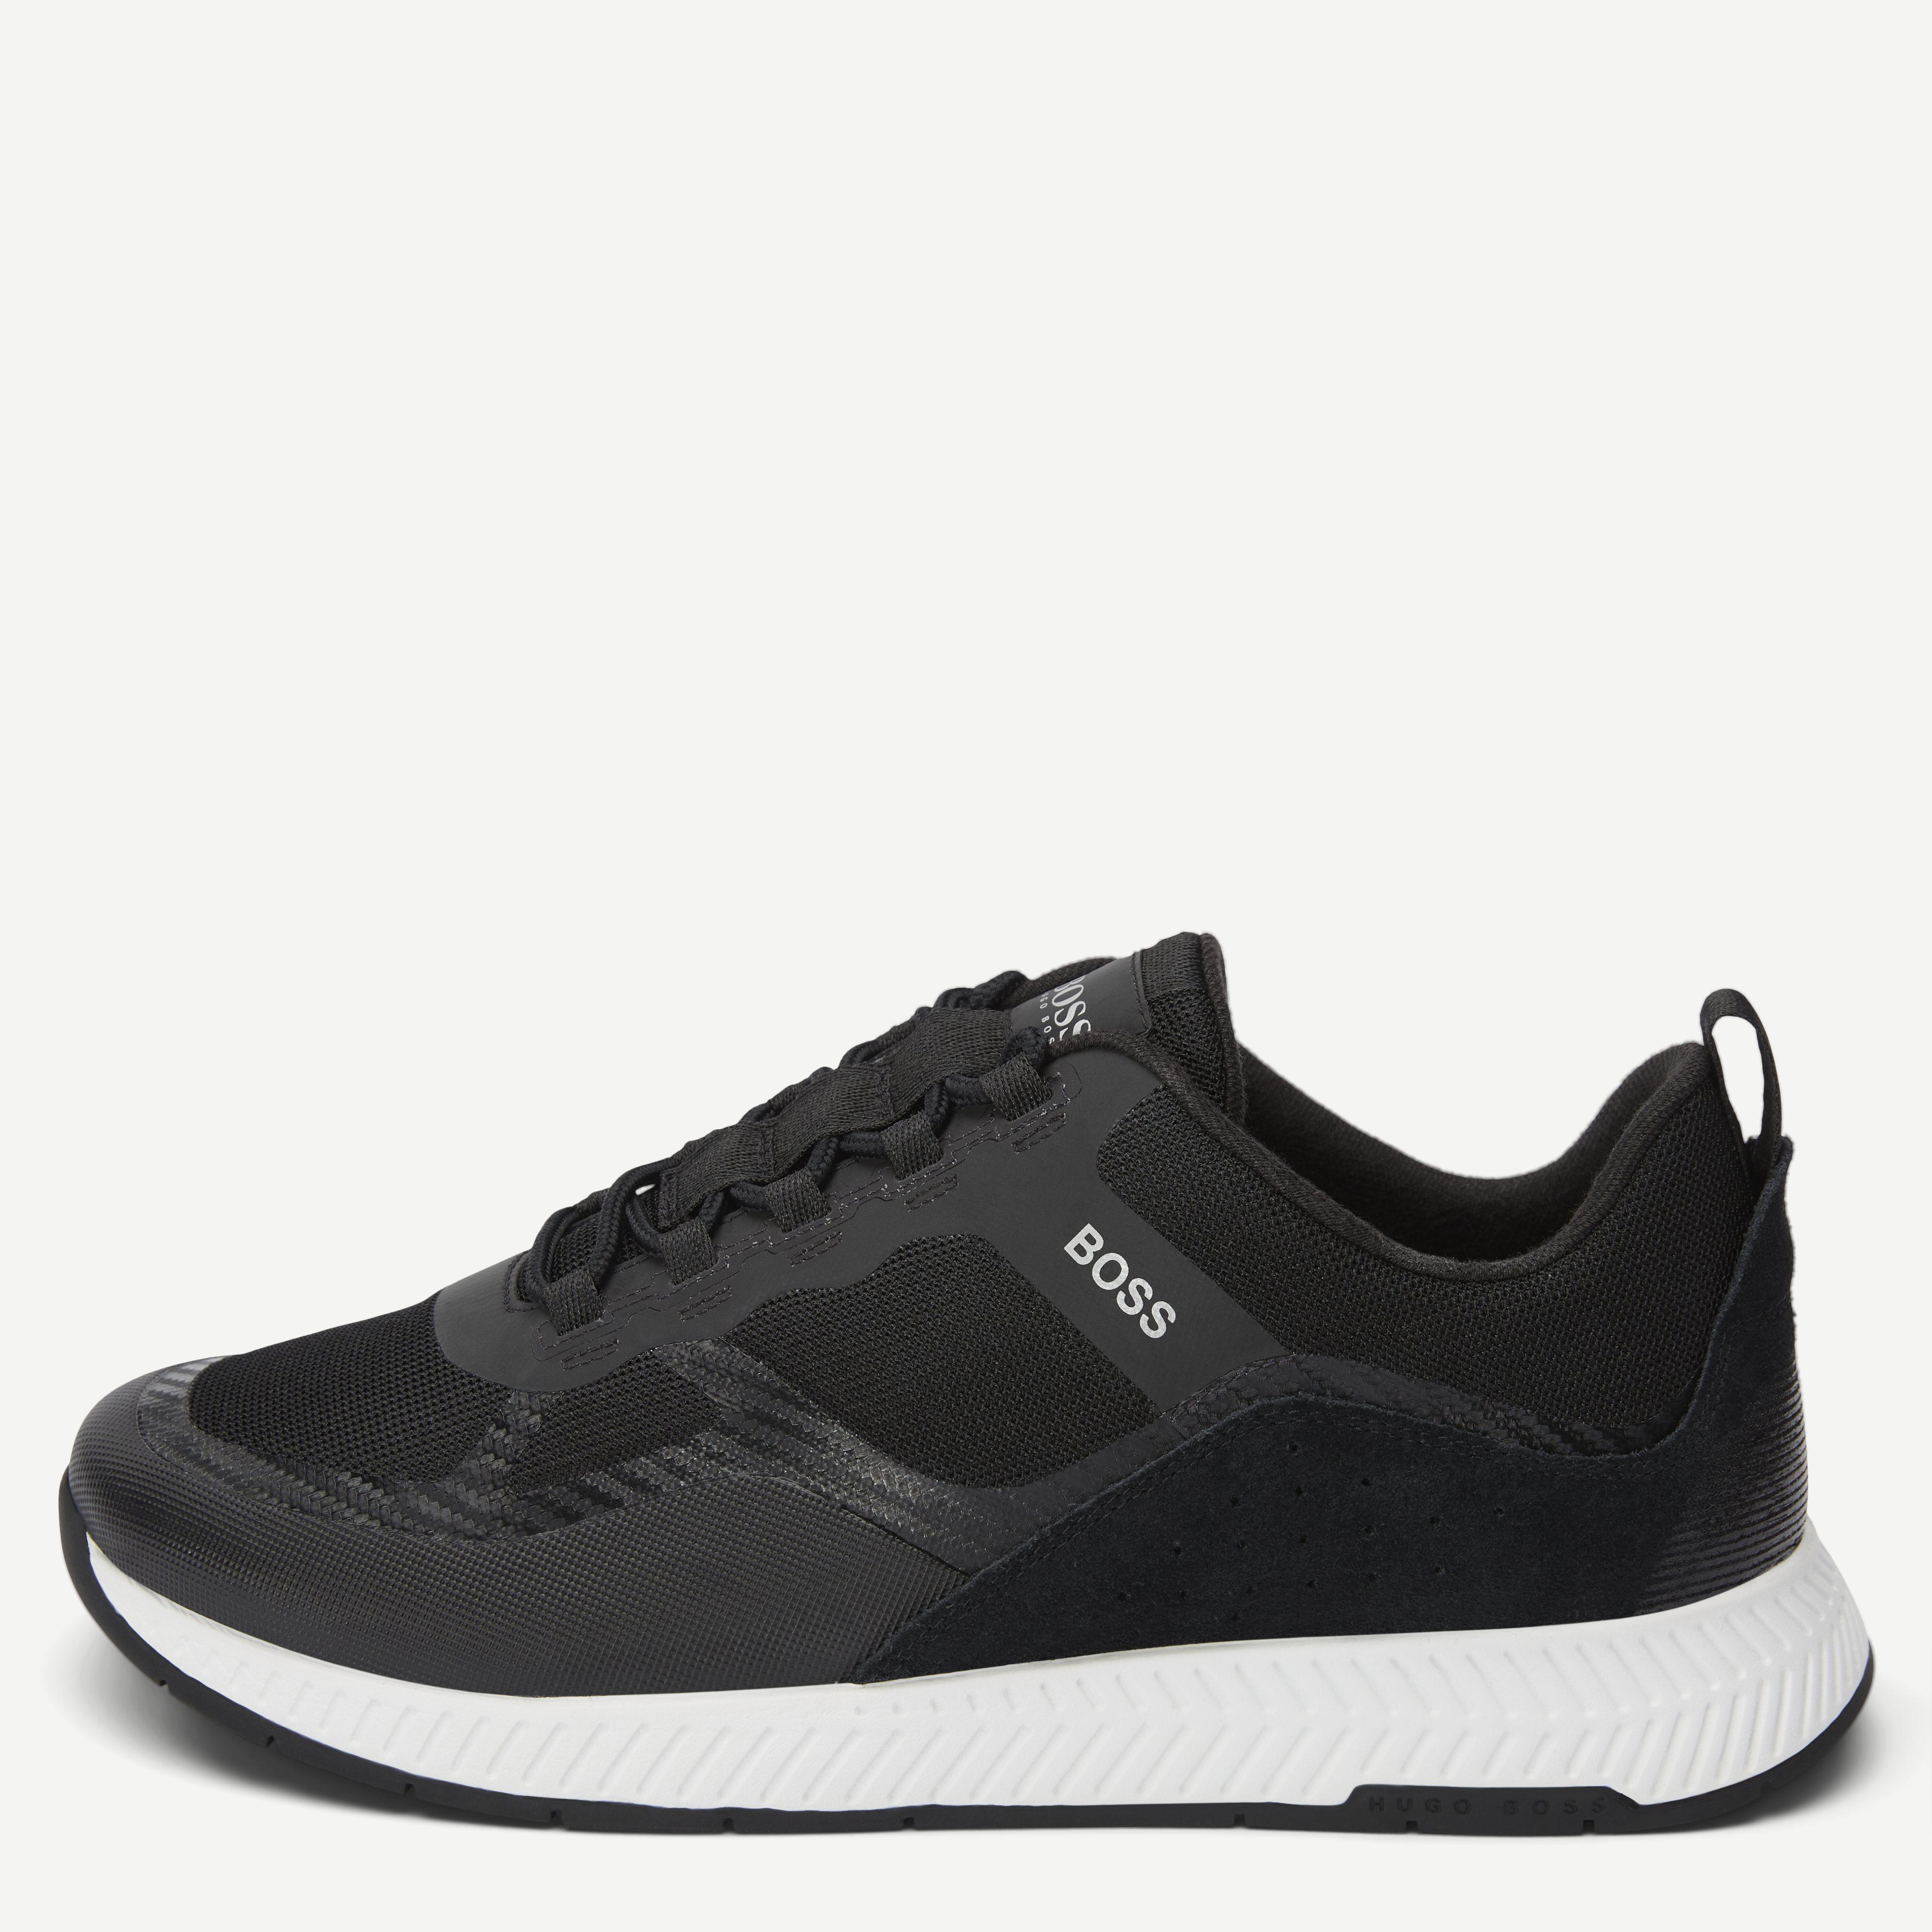 Titanium_Runn_MEMX Sneaker - Shoes - Black